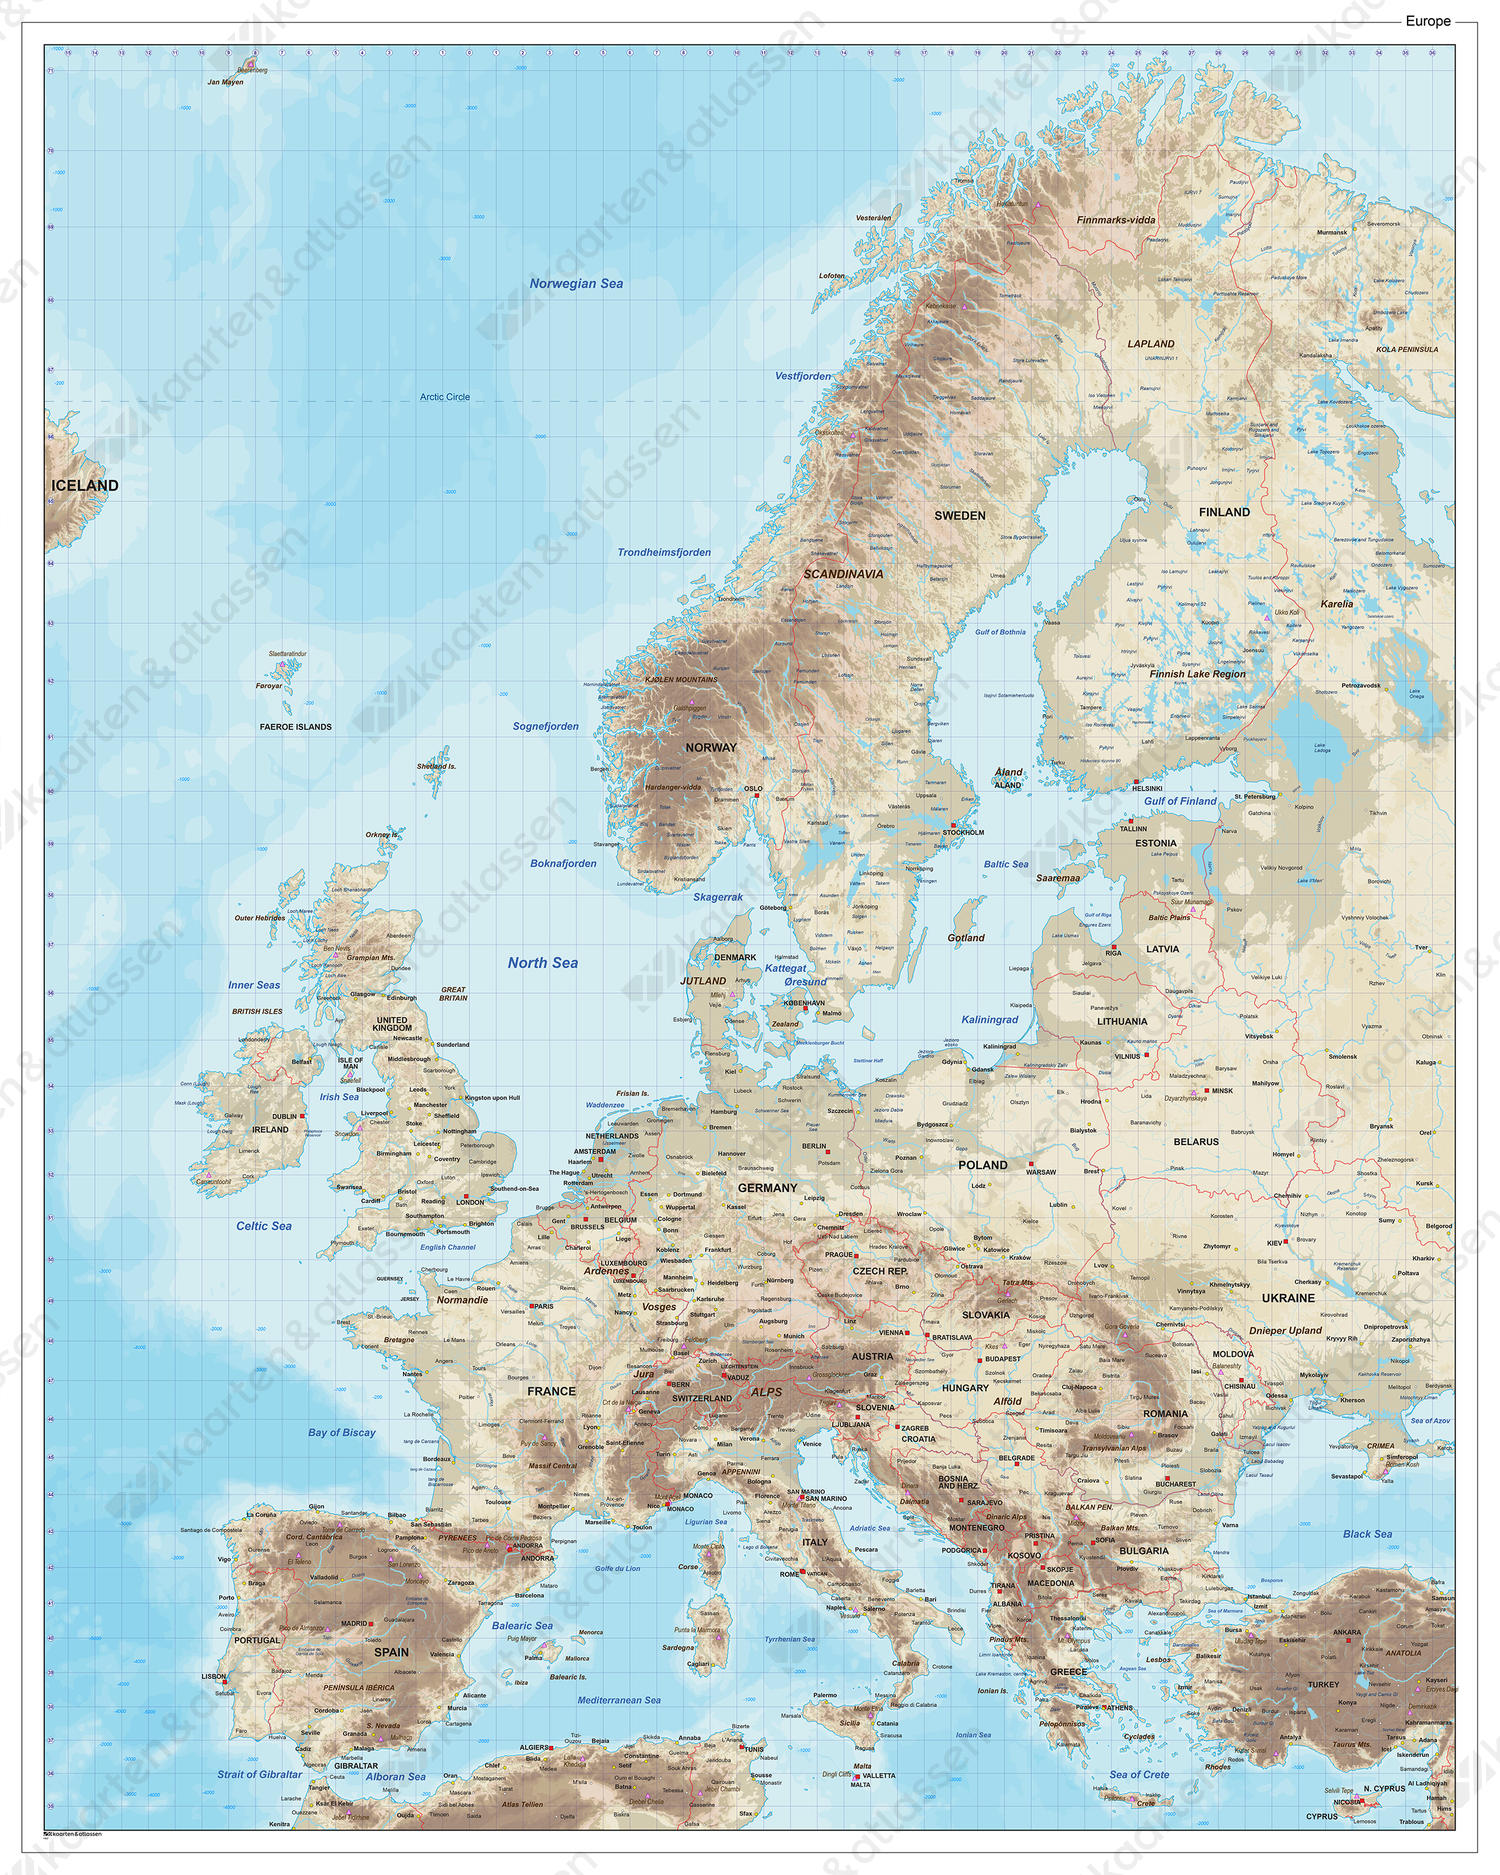 Natuurkundige Europakaart